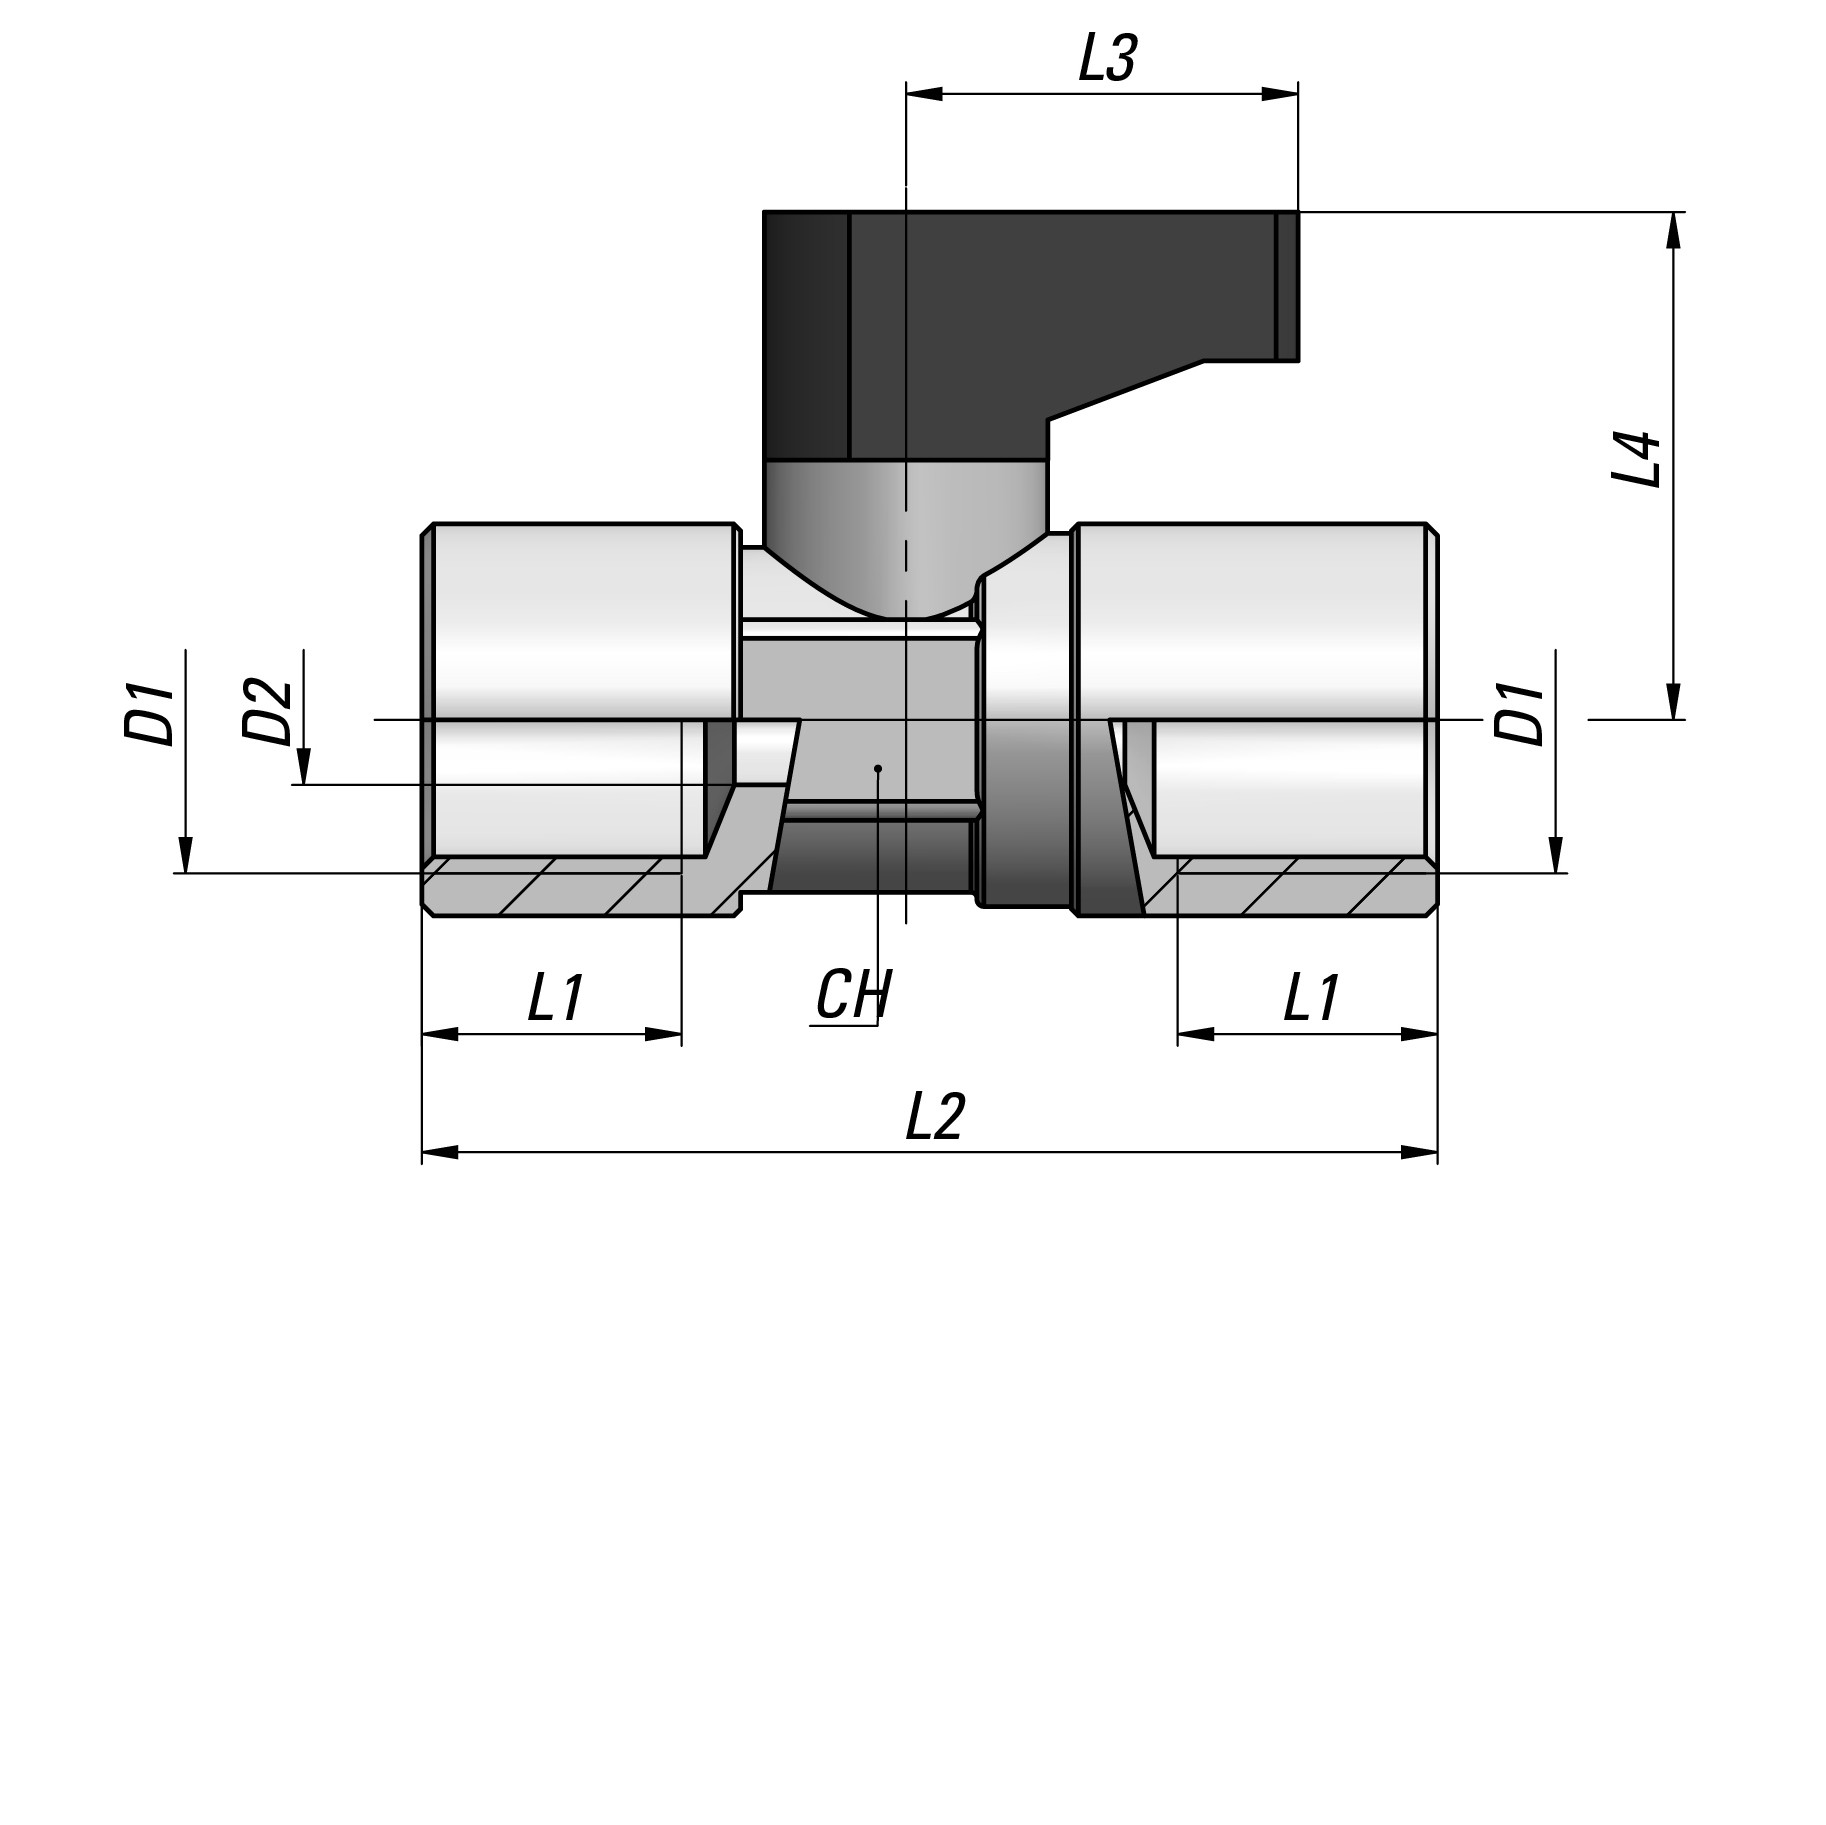 MV53 00 38